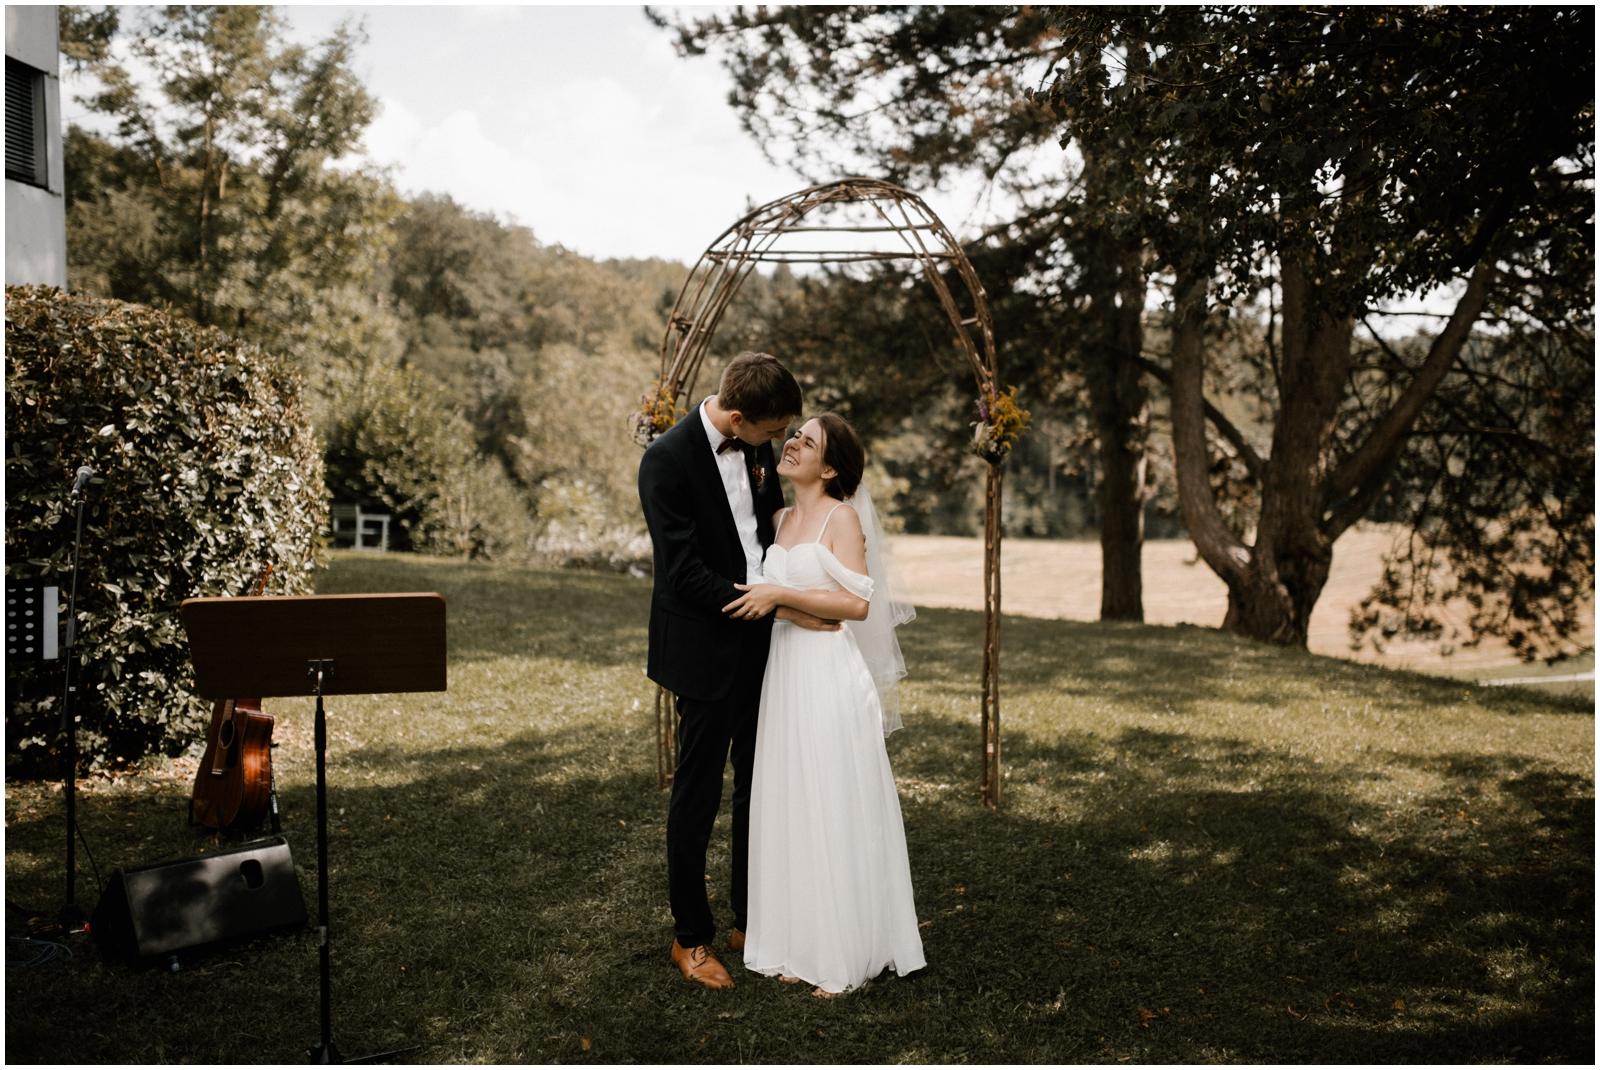 mirjam_thomas_wedding-414.jpg